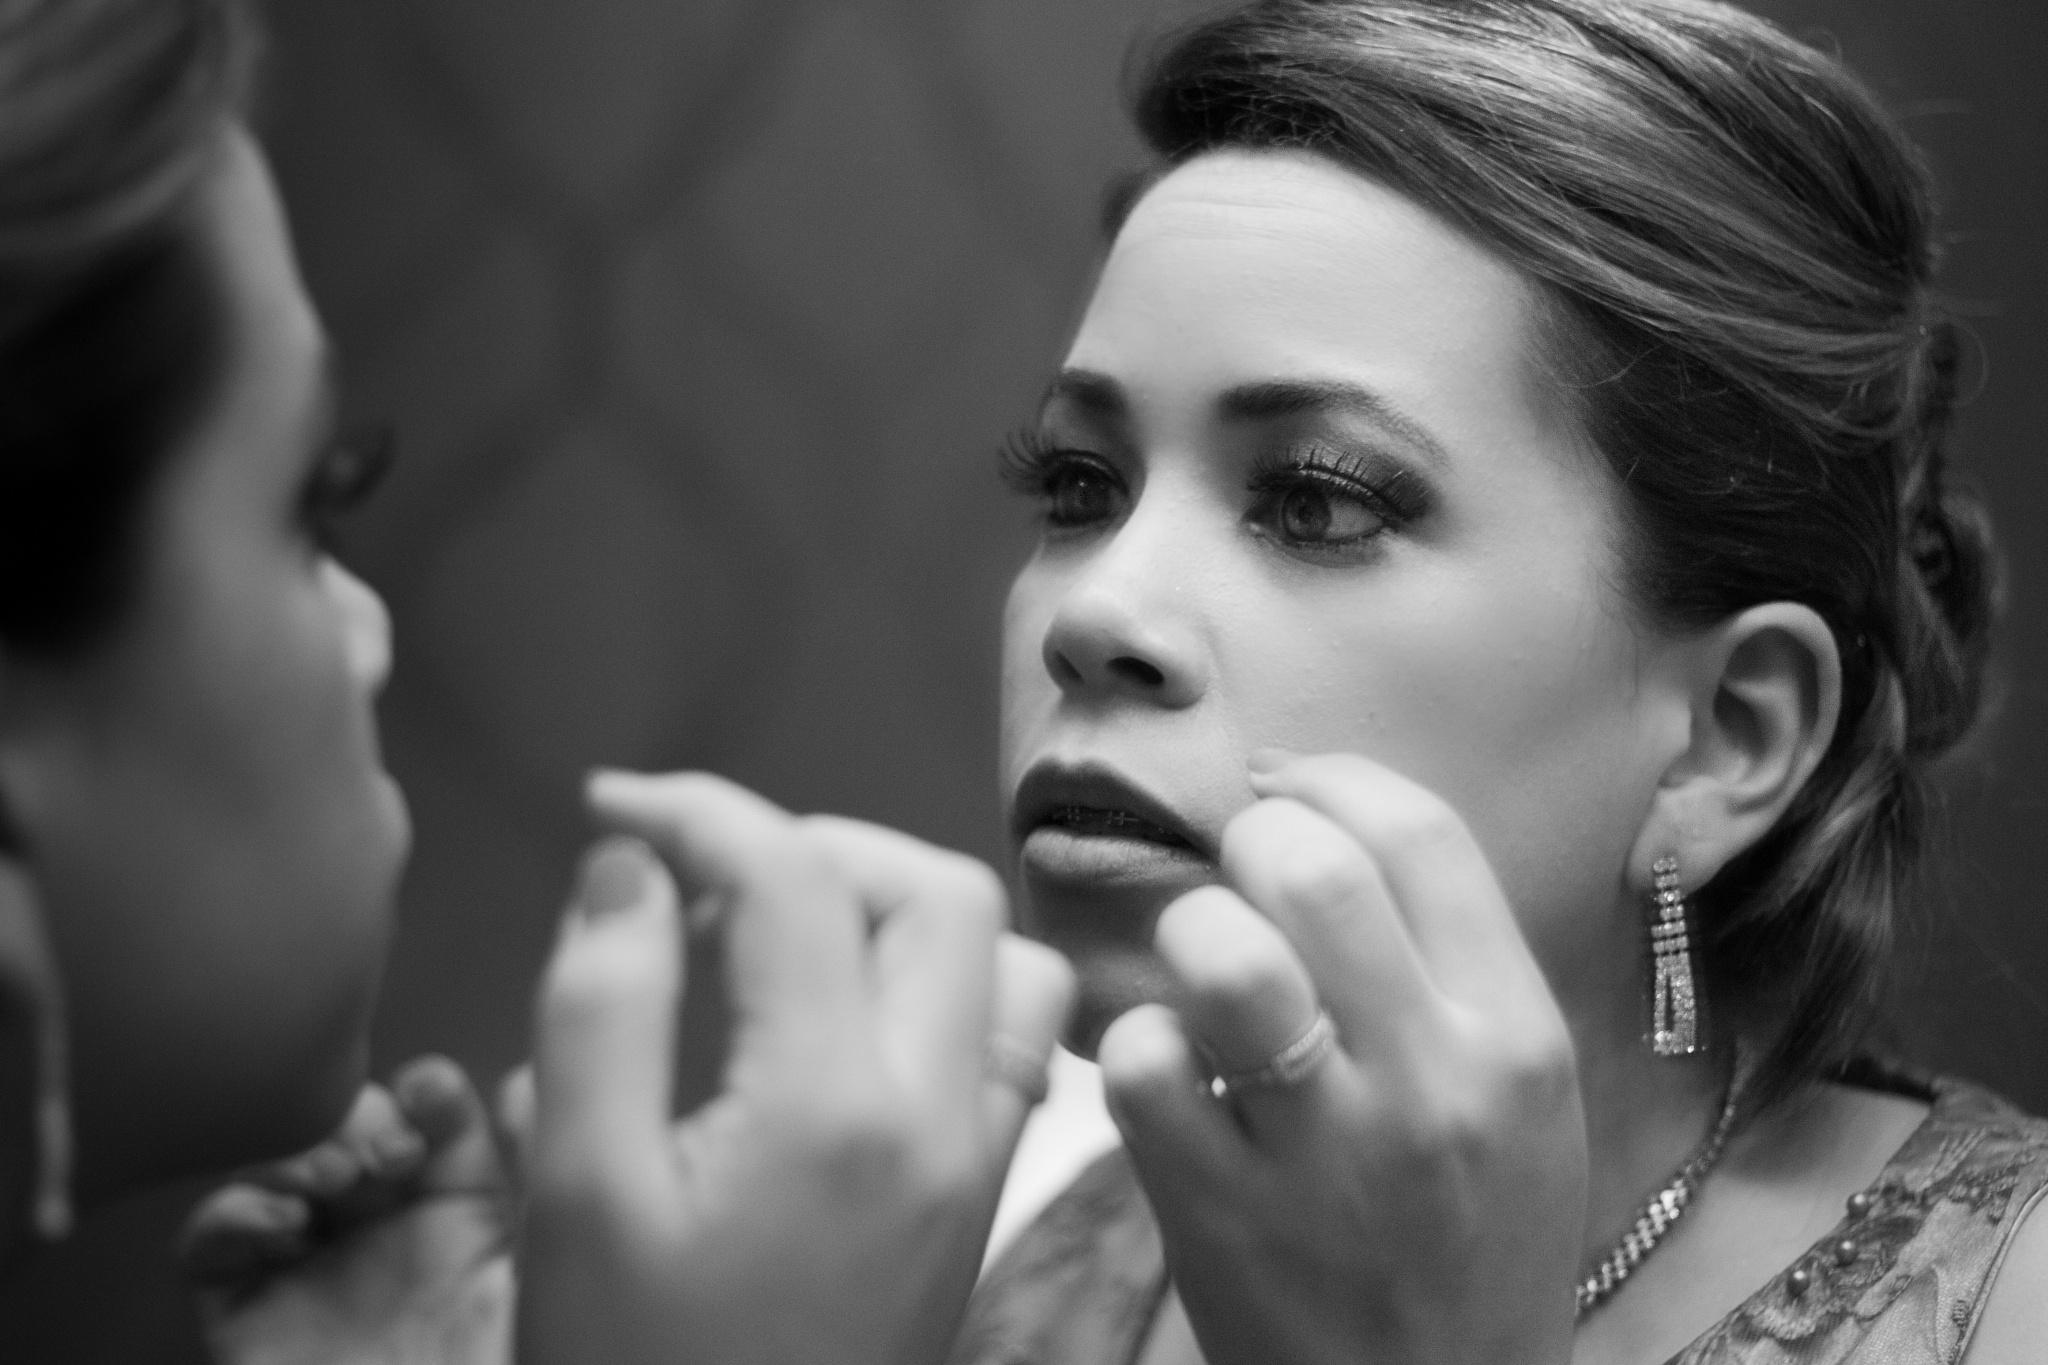 Make up by Tiago Deliberali Santos